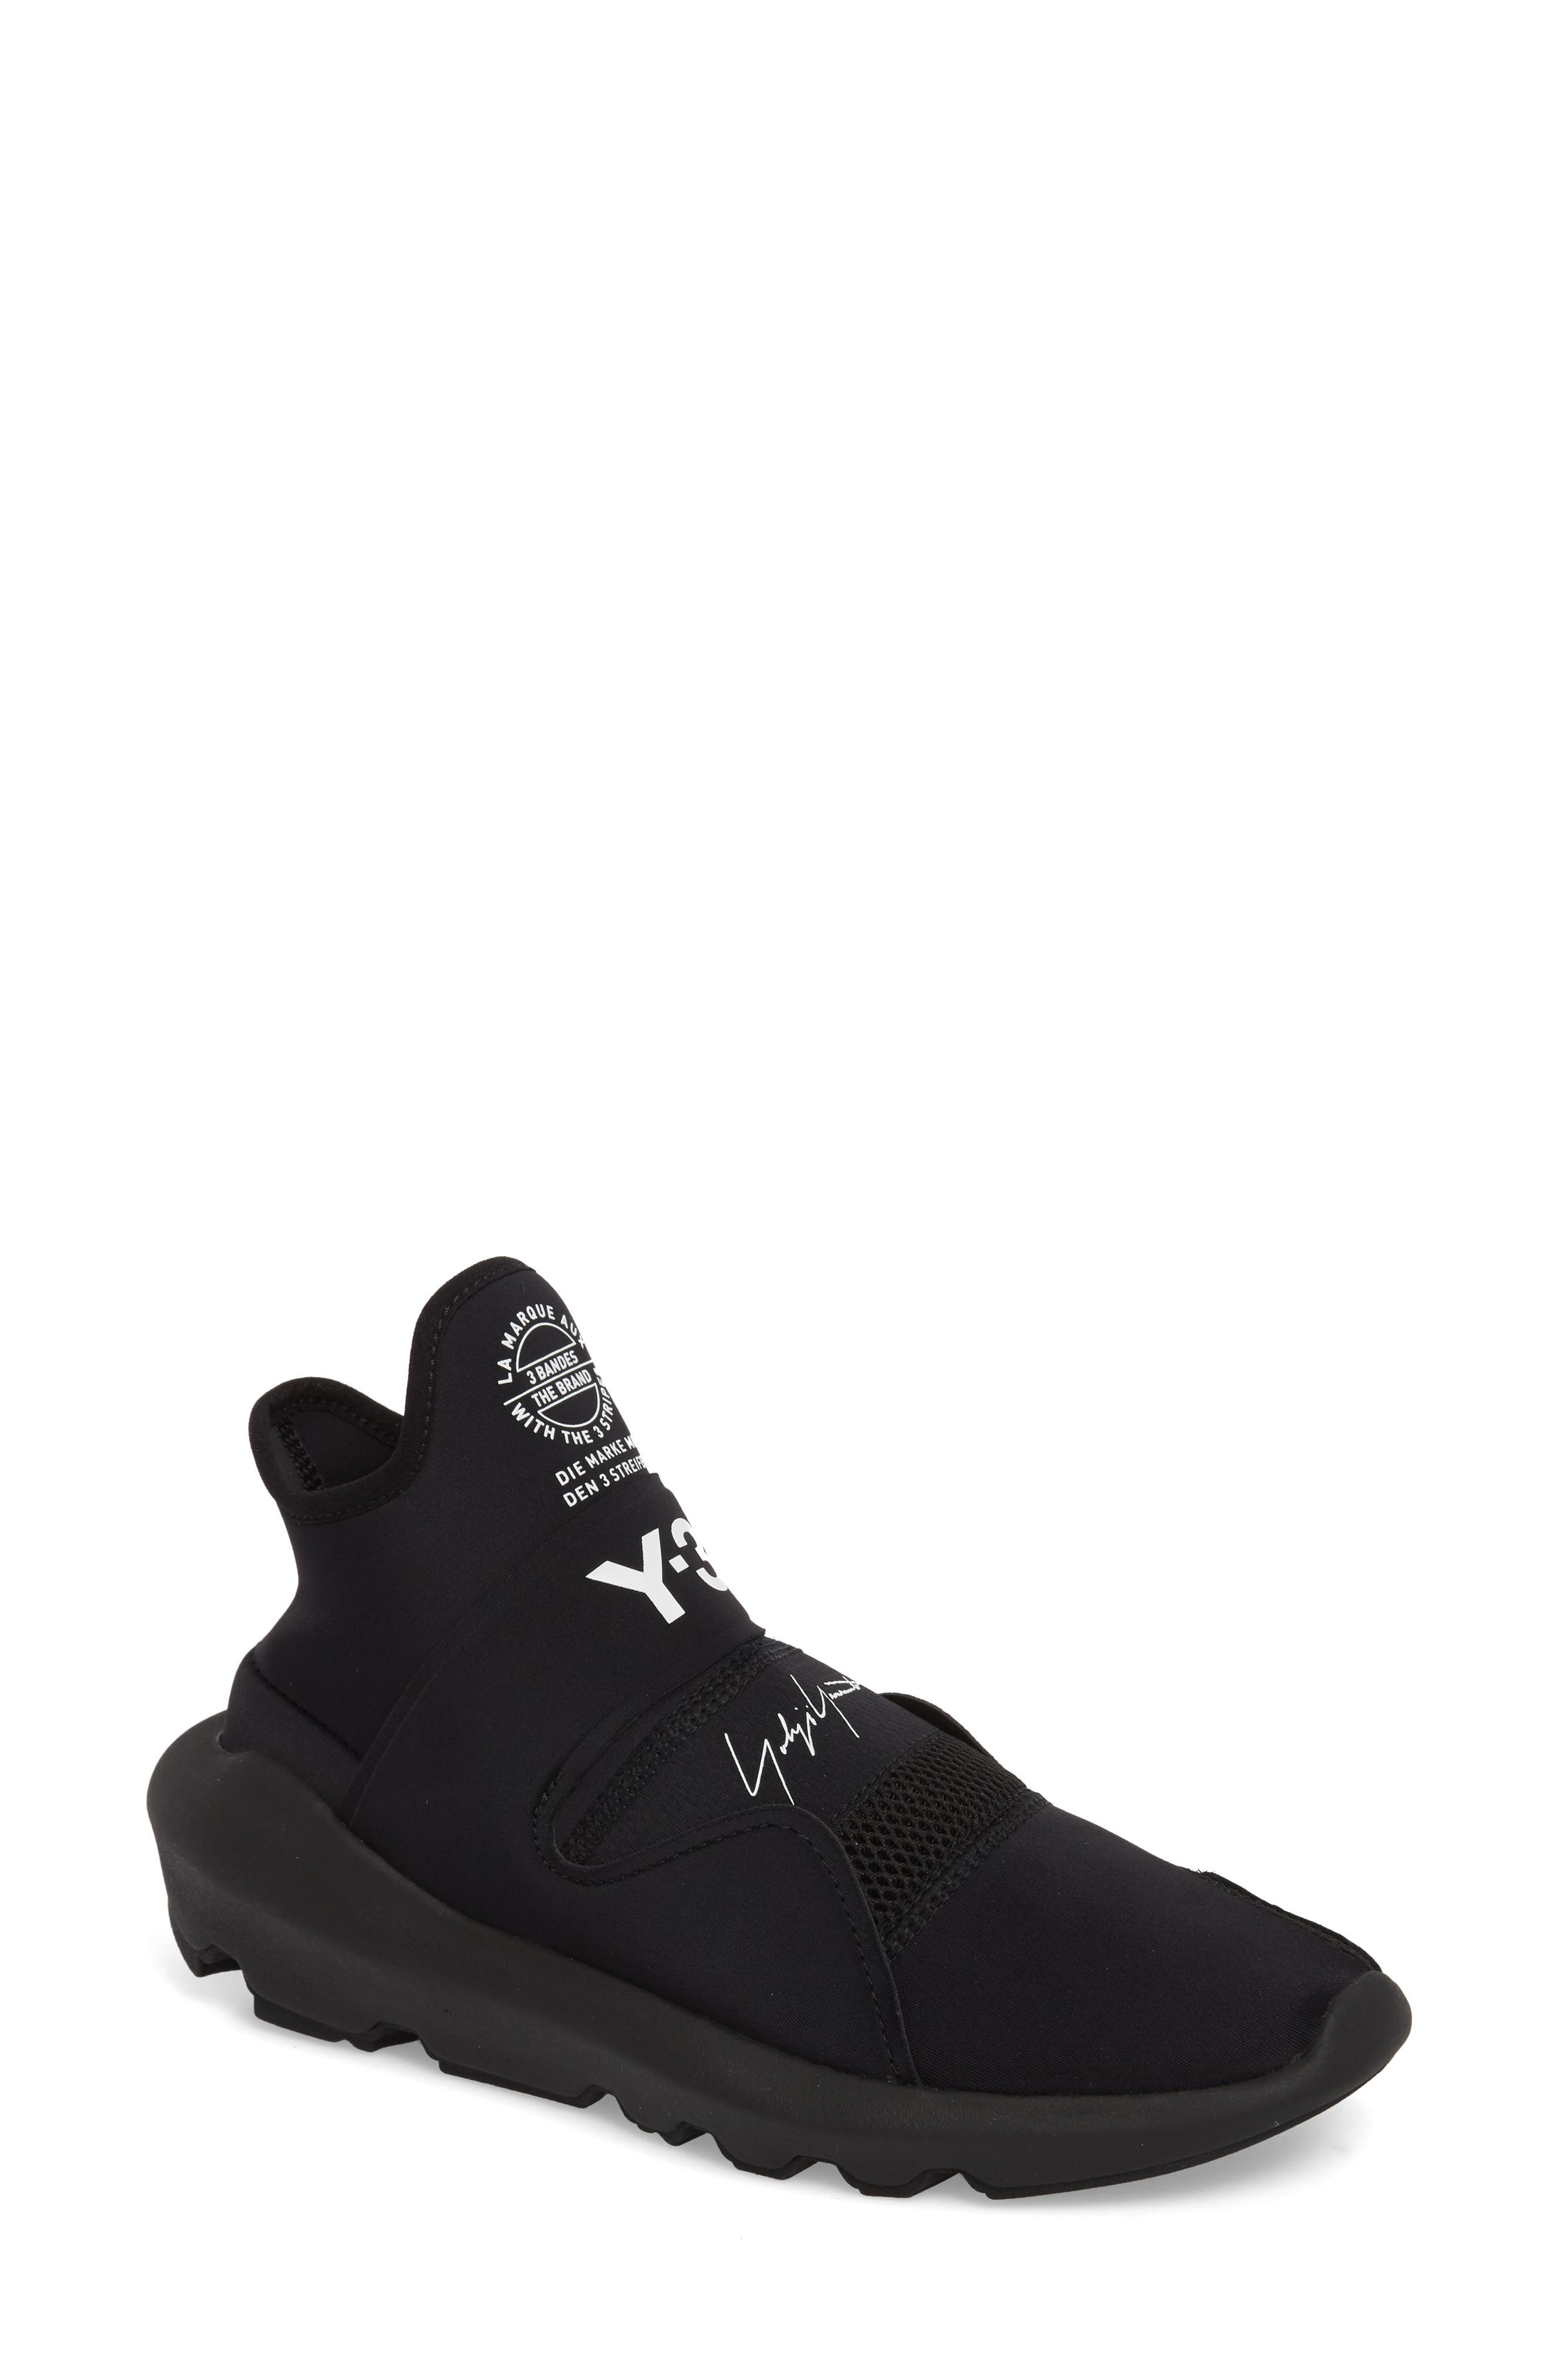 Superbou Sneaker,                         Main,                         color, Black / Core White